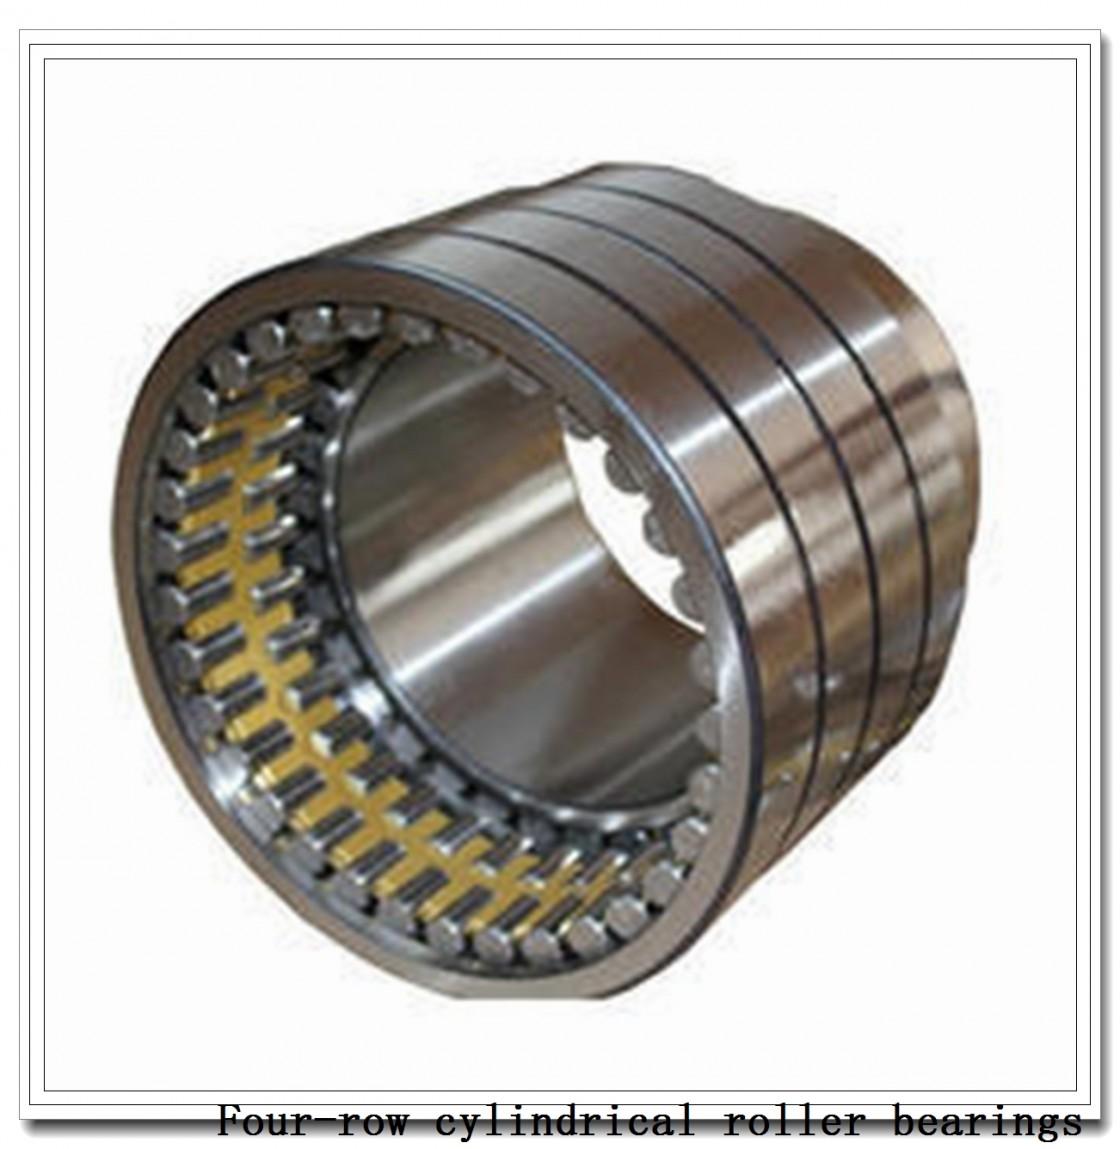 FC76112325B Four row cylindrical roller bearings